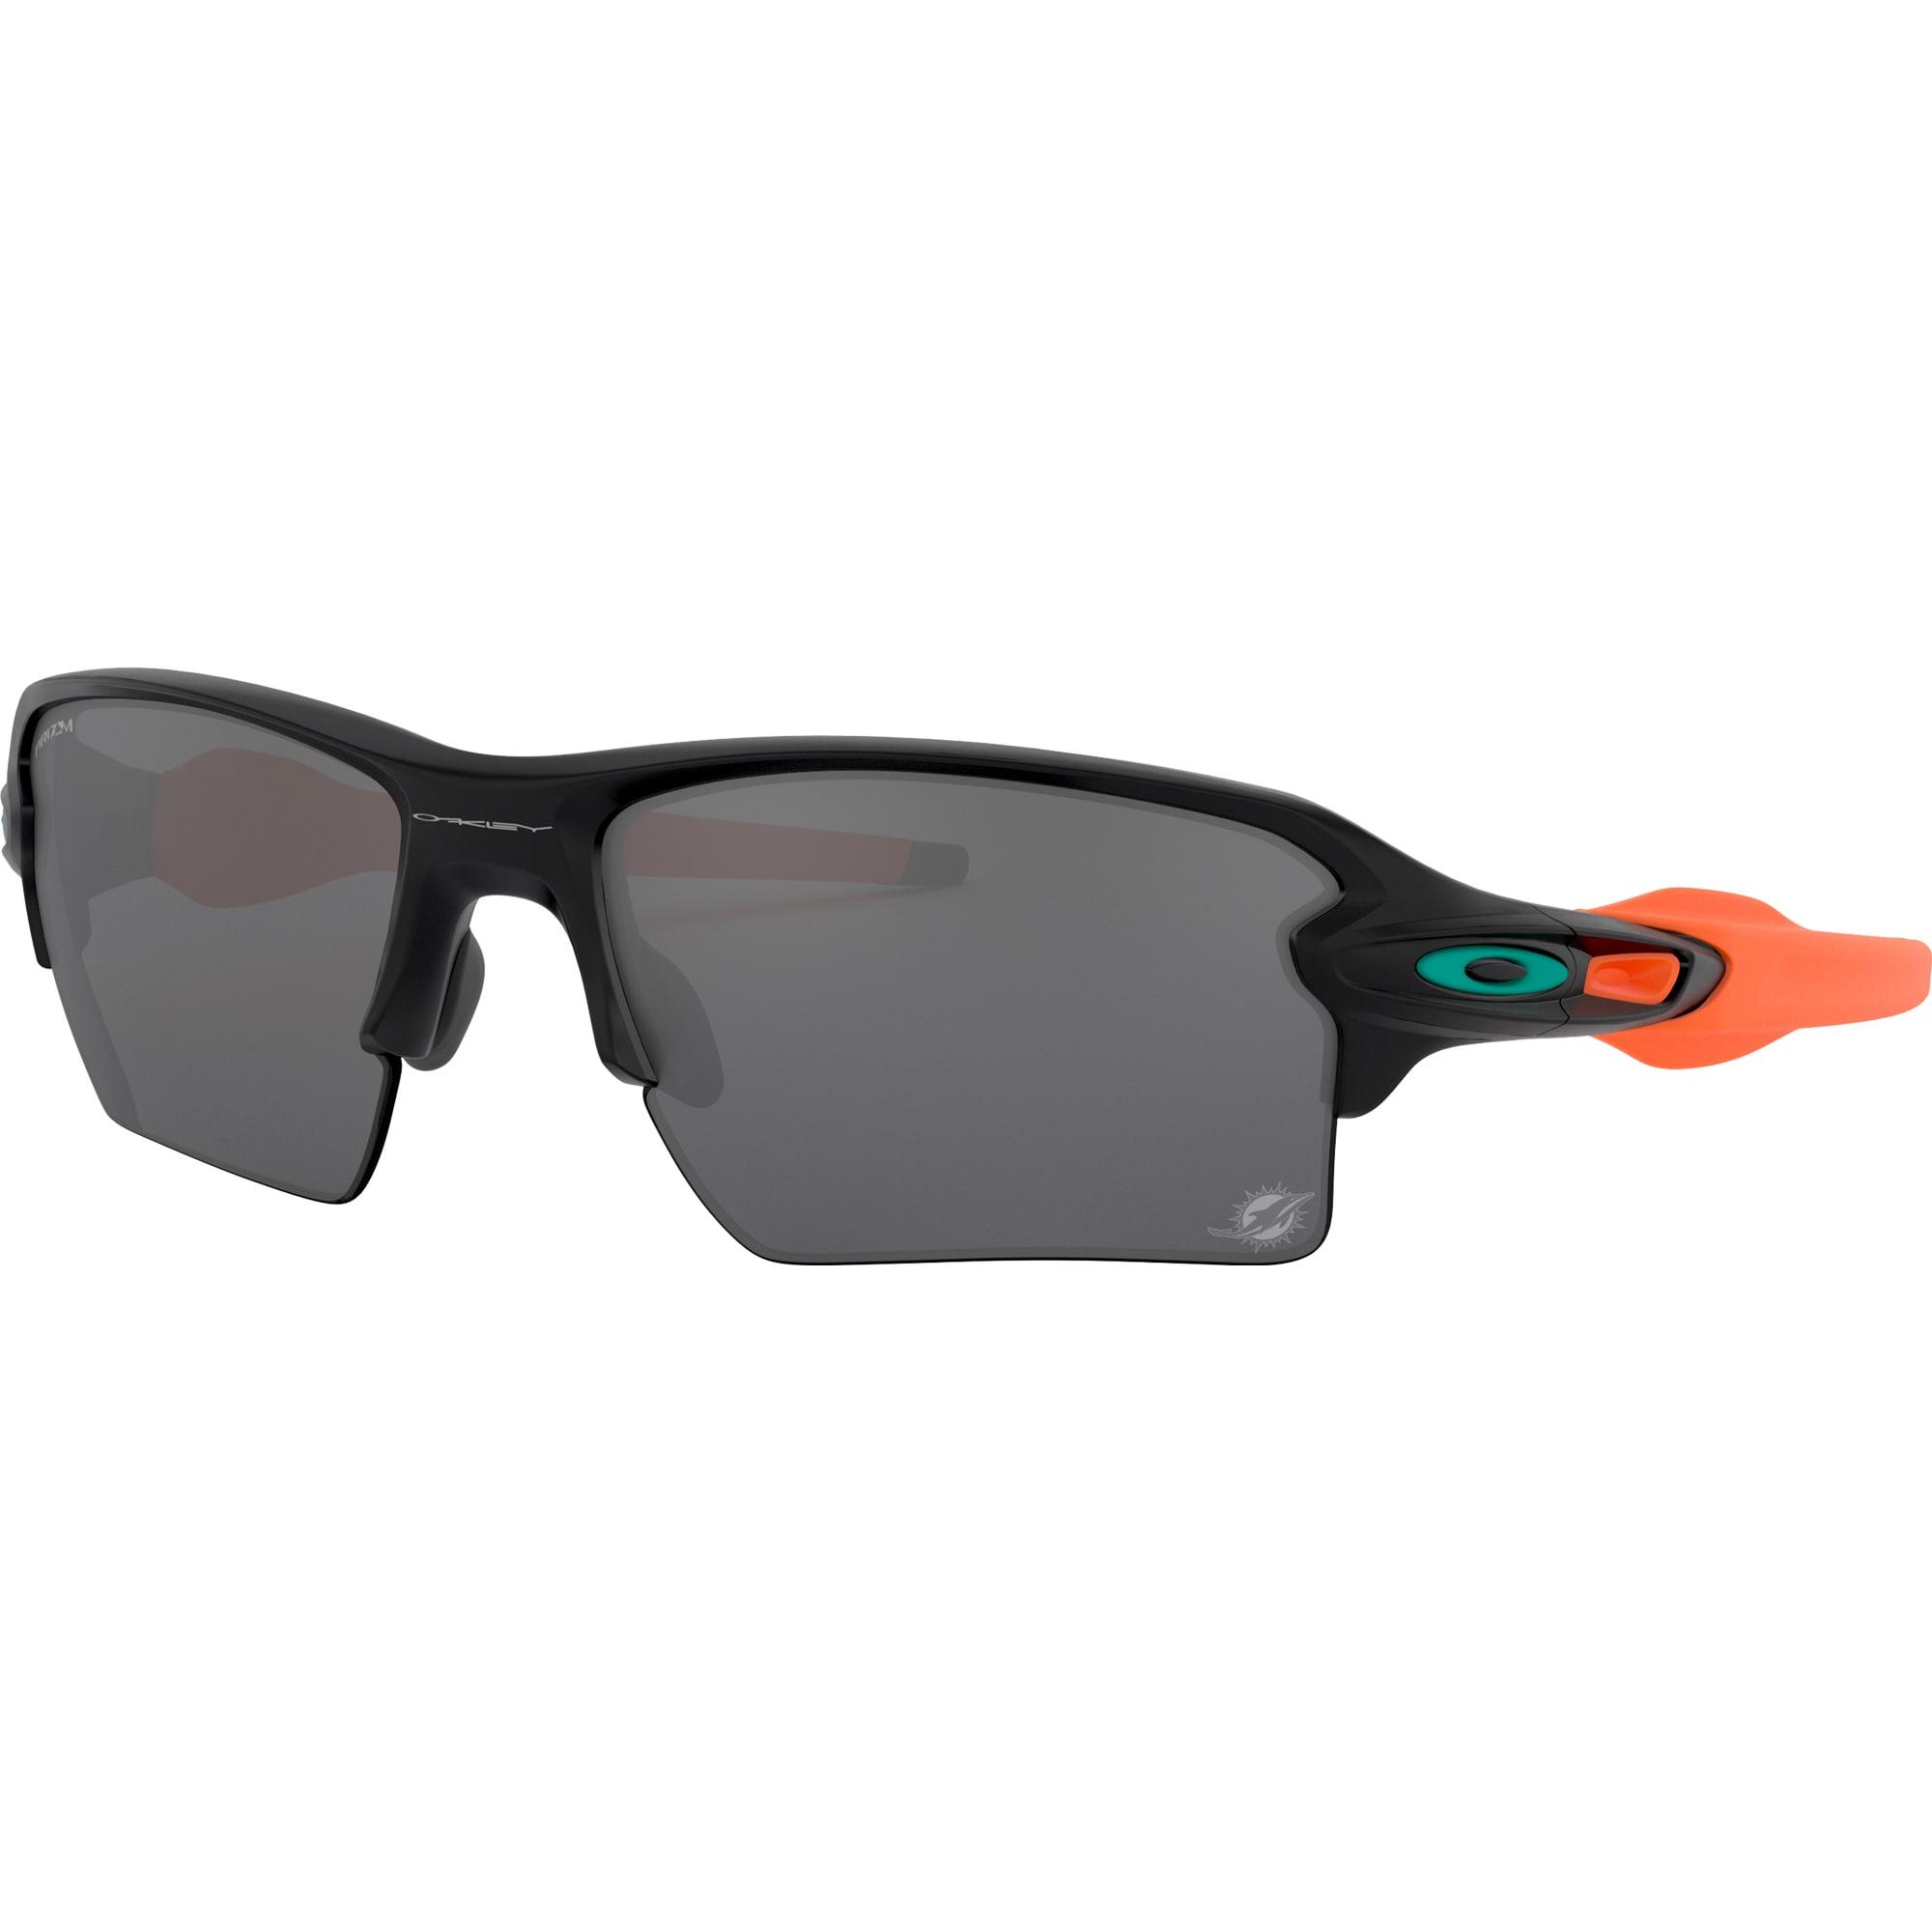 Miami Dolphins Oakley Flak 2.0 XL Sunglasses